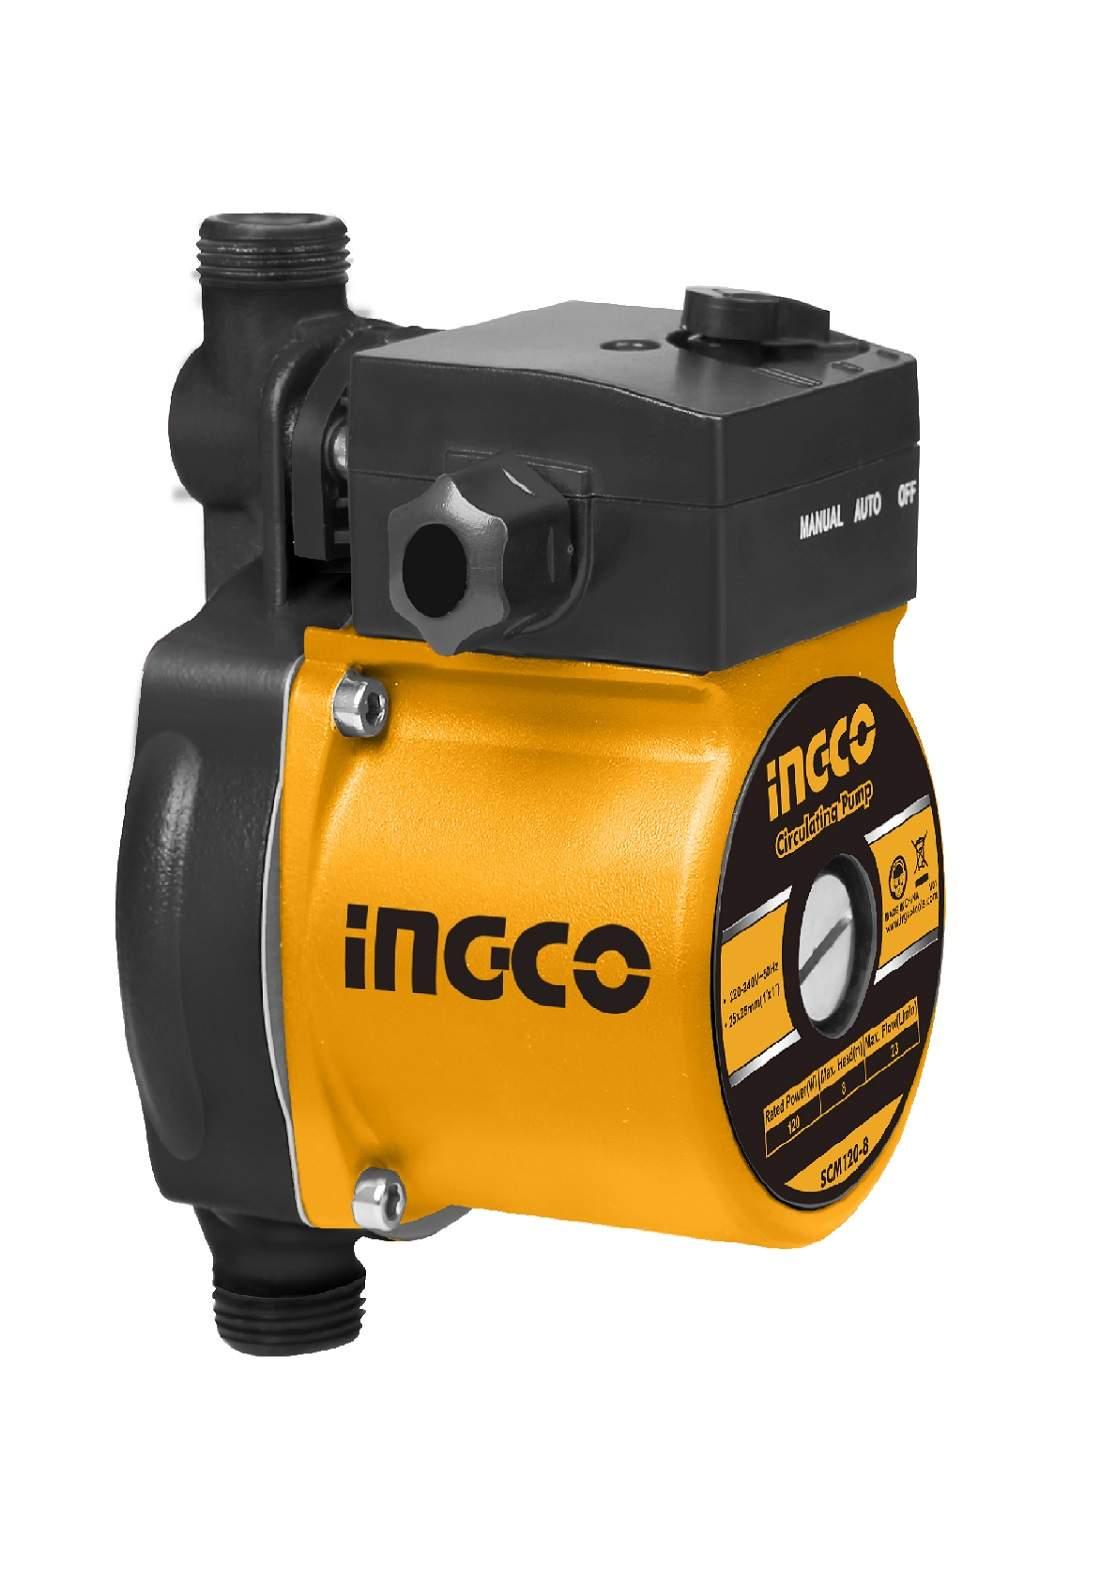 INGCO SCM120-8 ماطور نحاس نازل